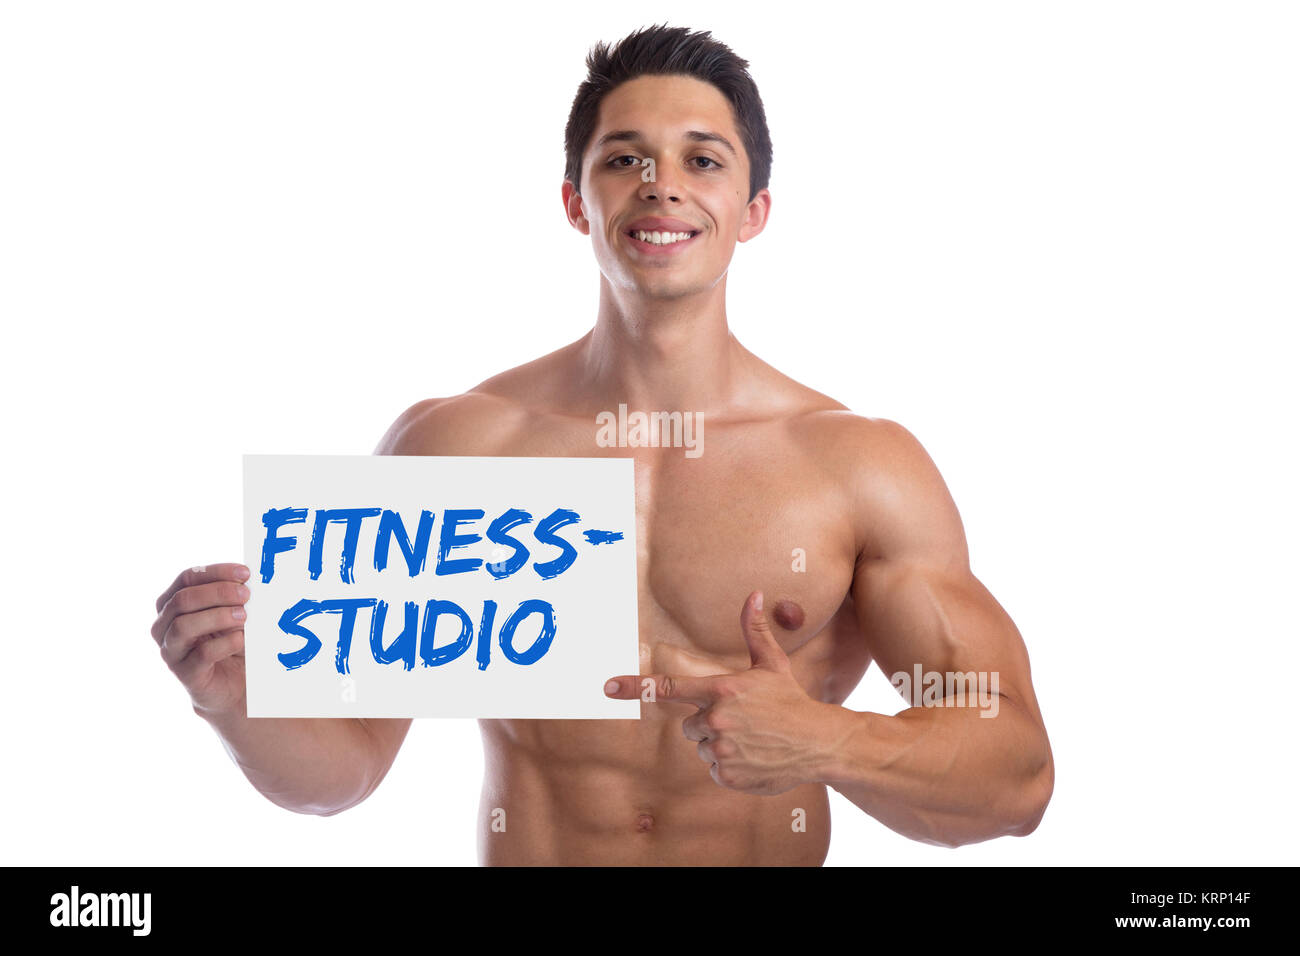 bodybuilding bodybuilder muscles fitness studio gym shield body ...